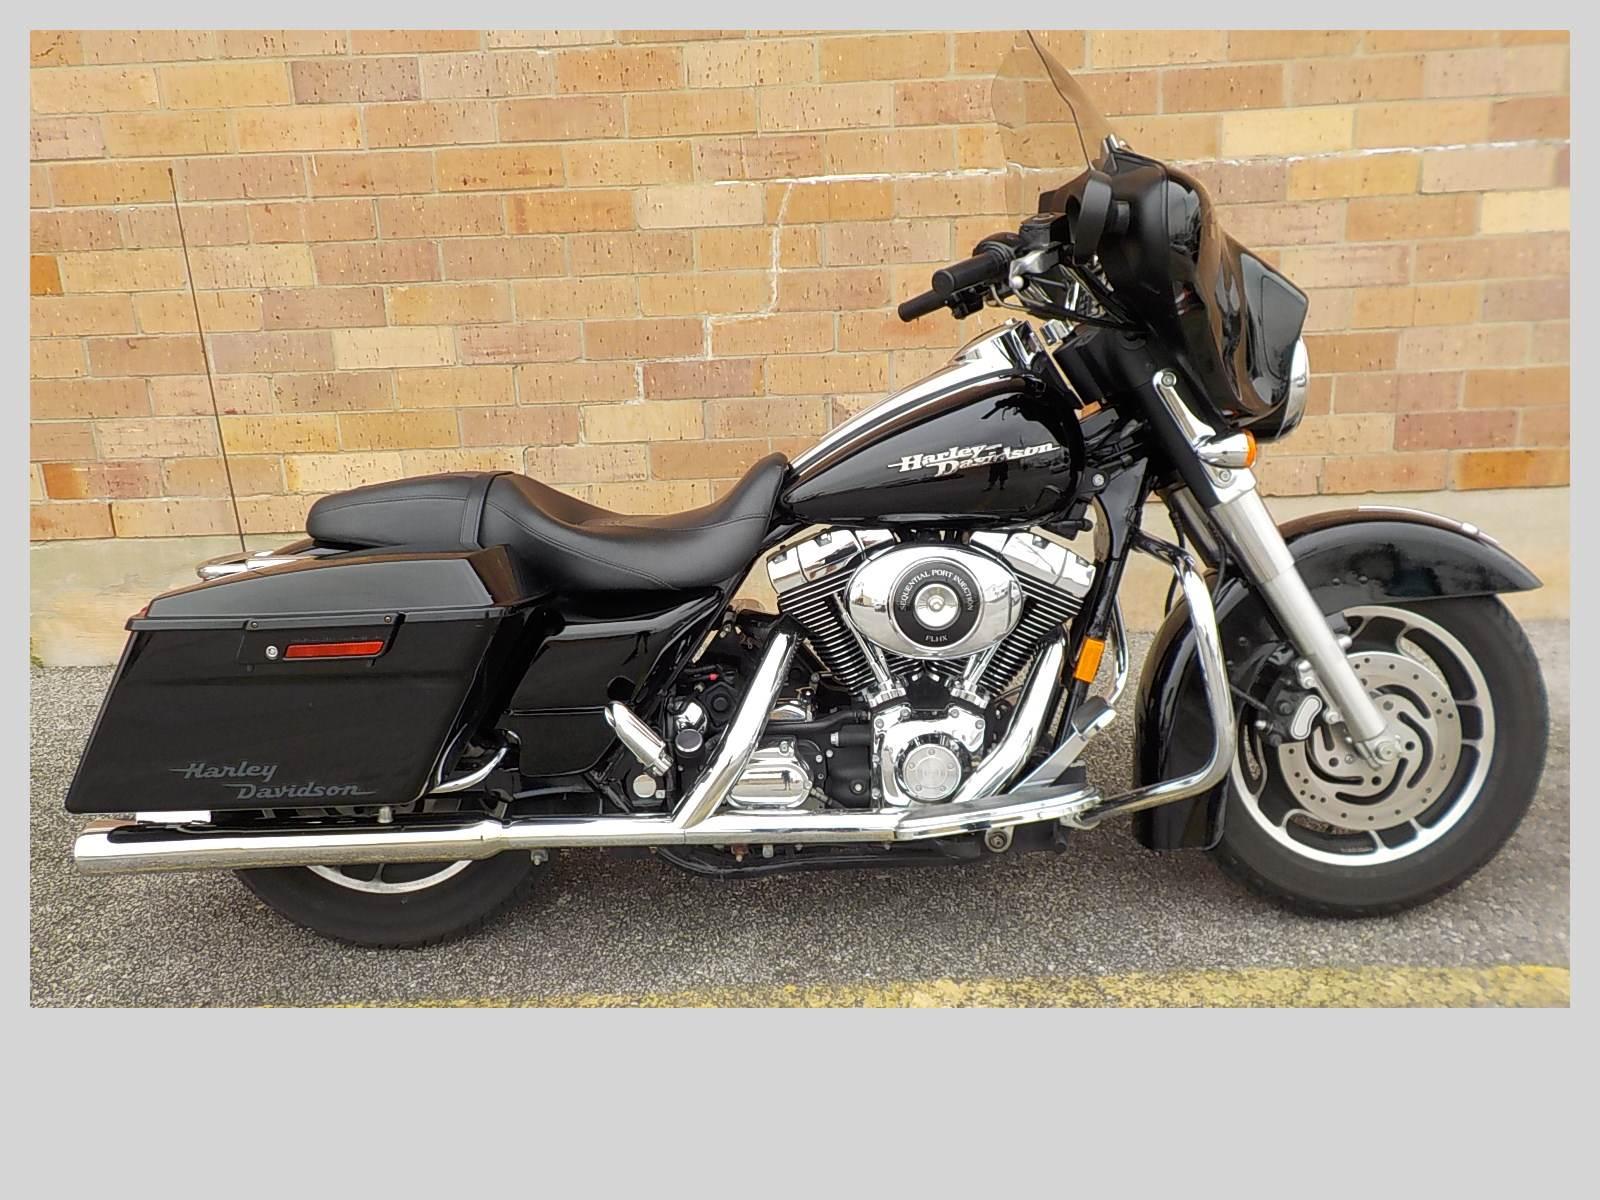 2006 Harley-Davidson Street Glide 1